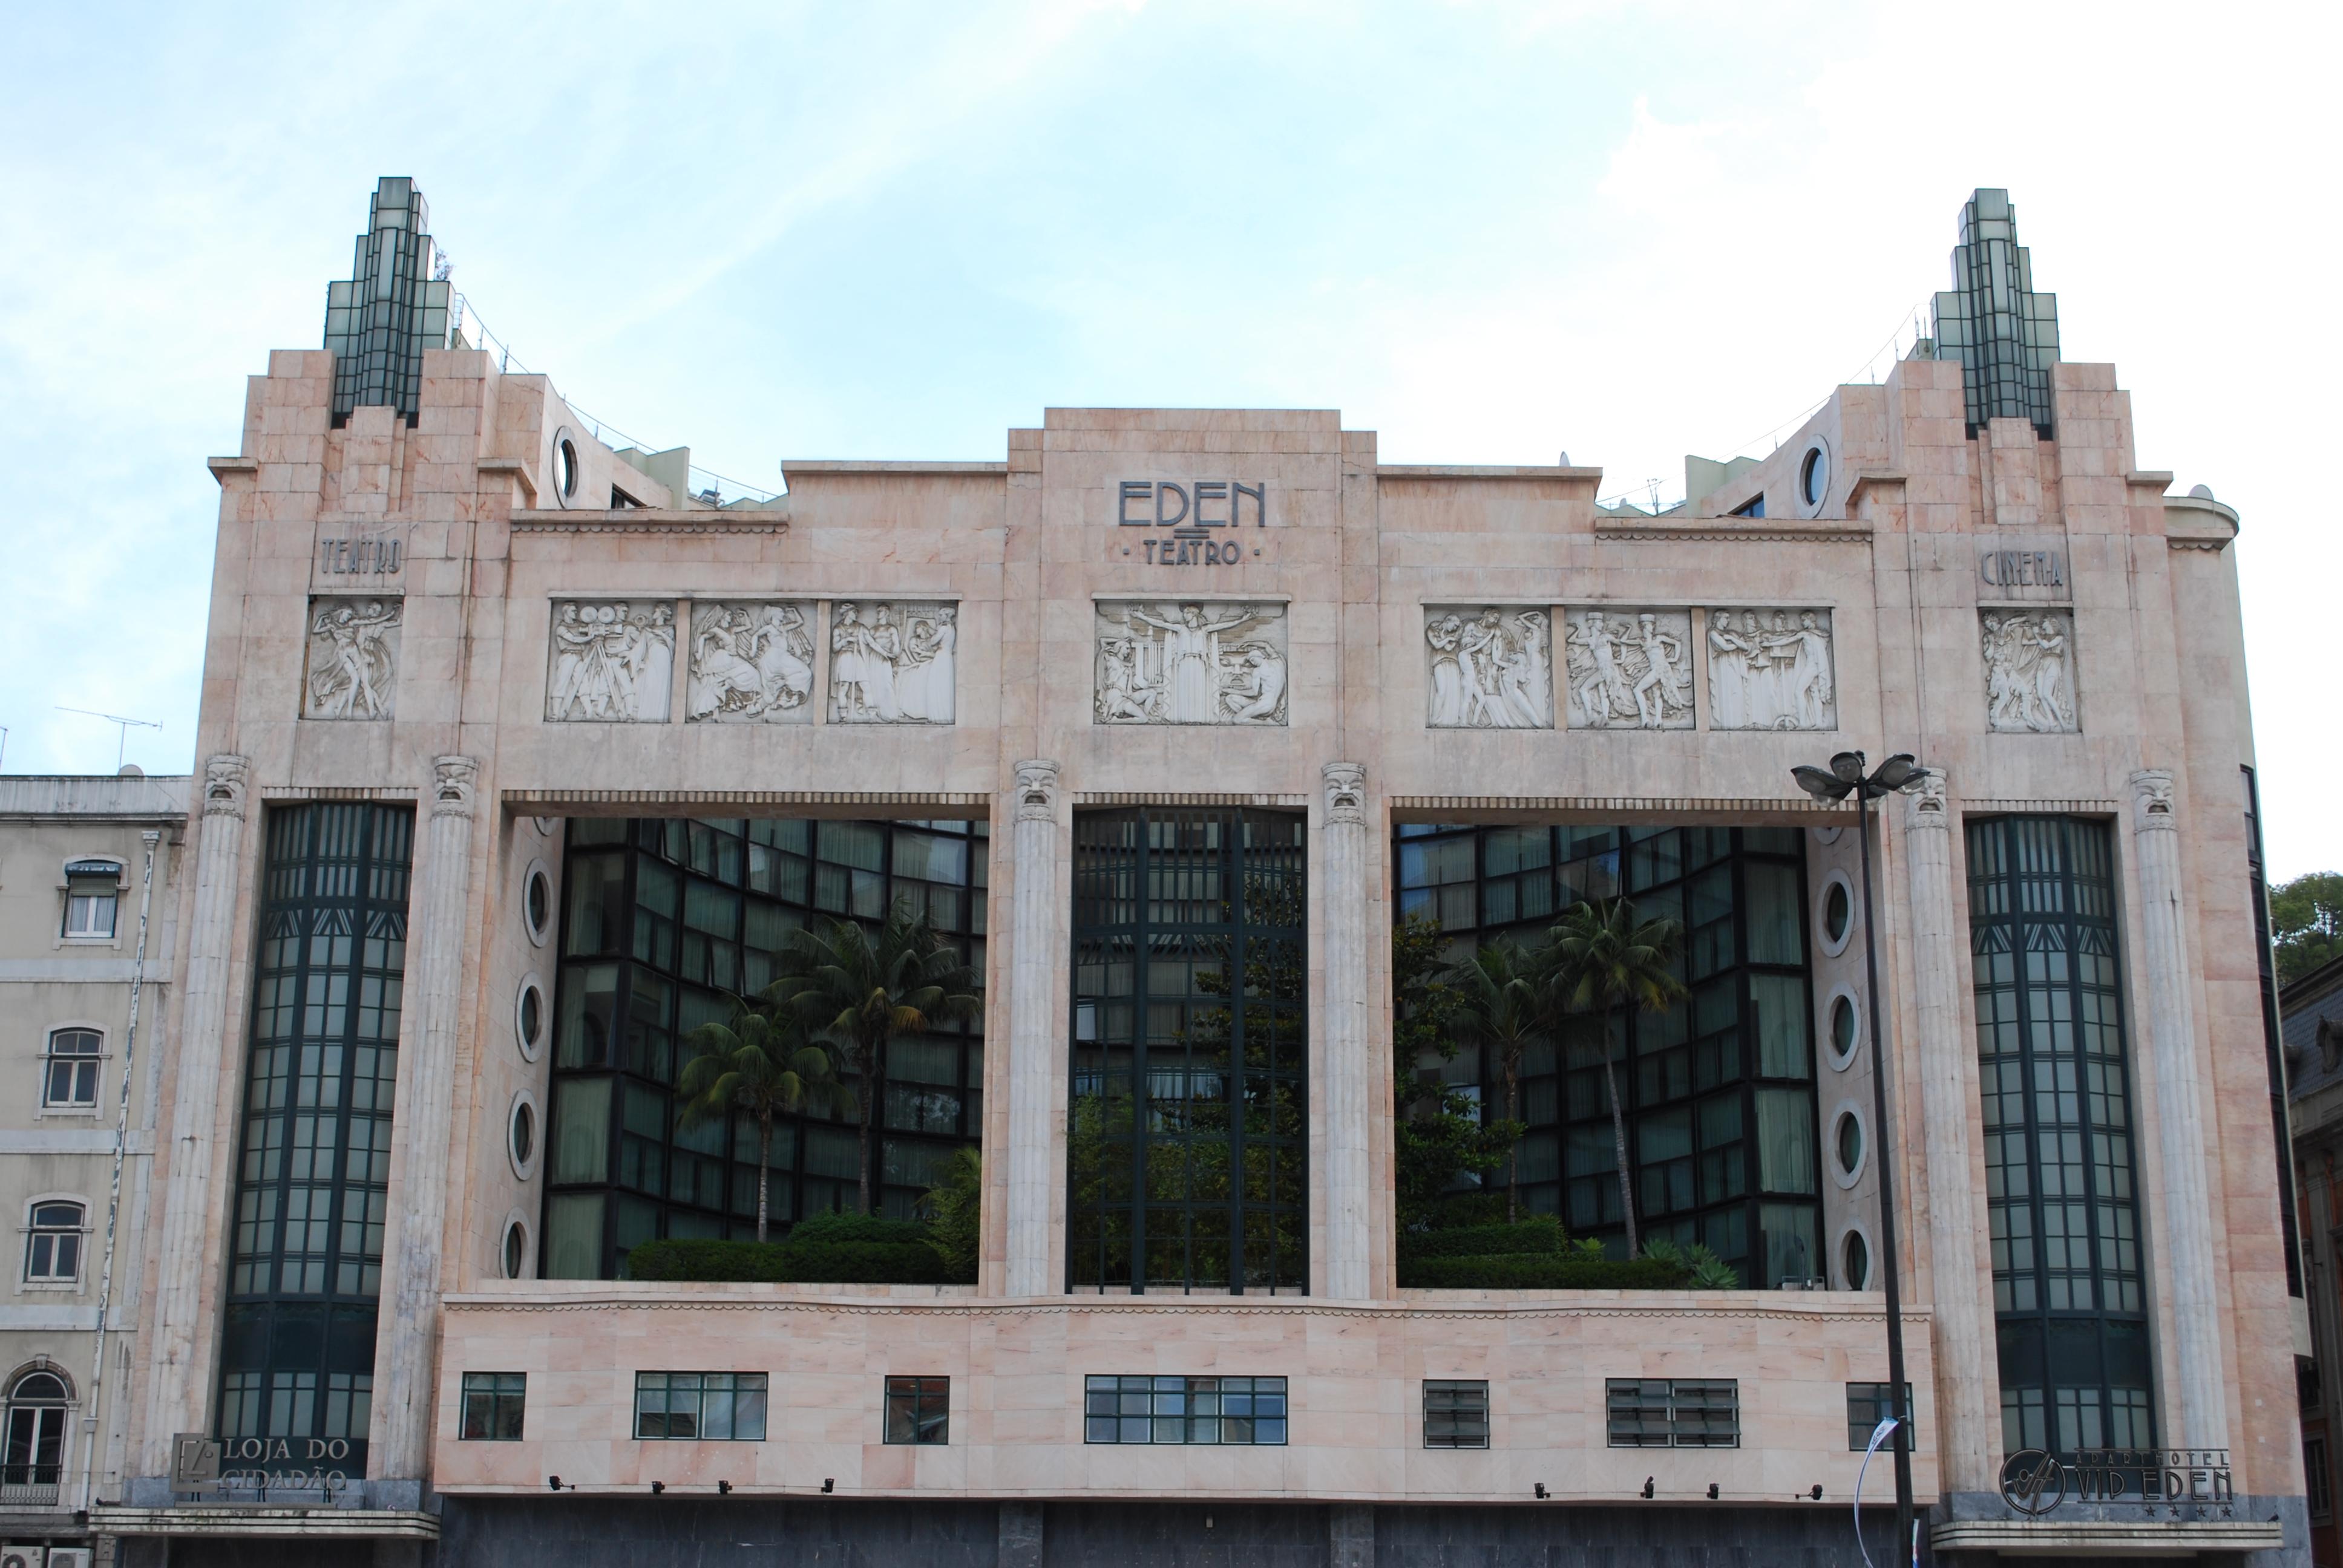 Teatro Eden Lisboa Fileteatro Wikimedia Commons